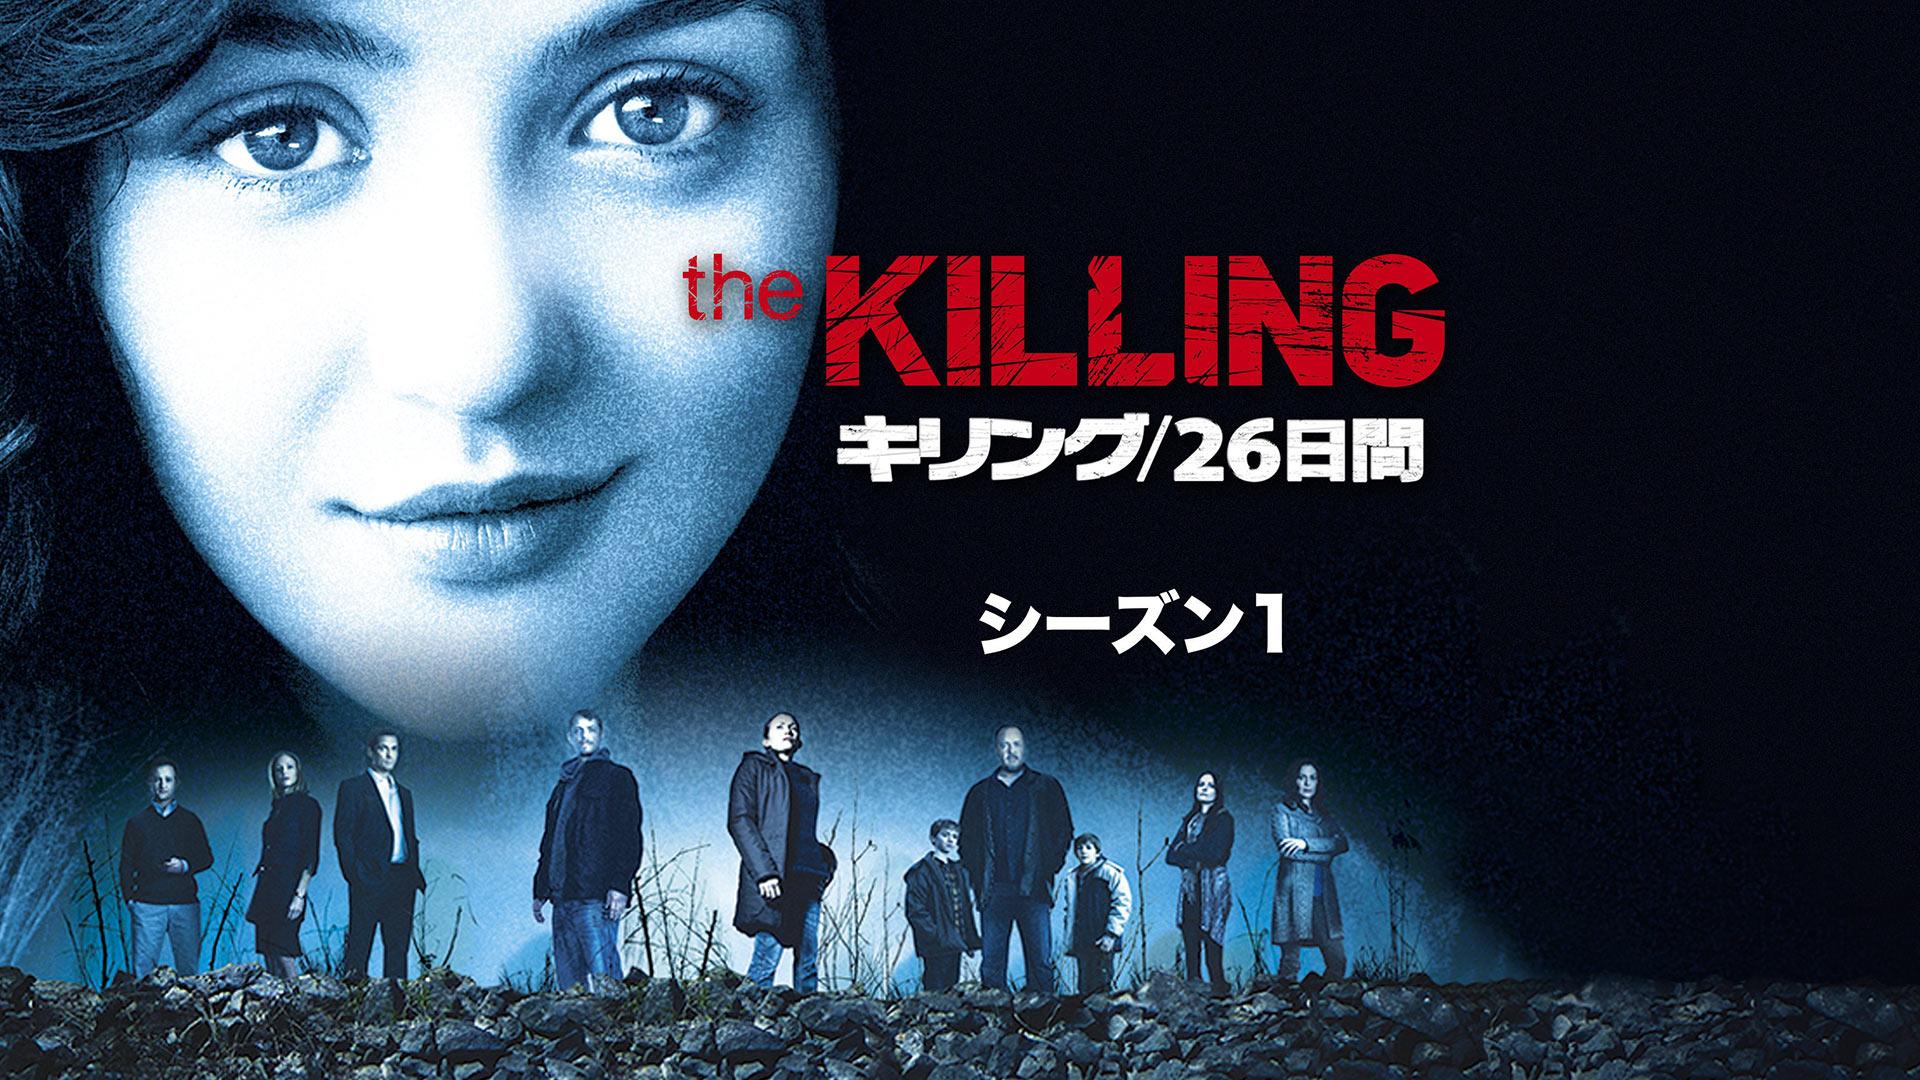 THE KILLING/ザ・キリング シーズン 1 (吹替版)